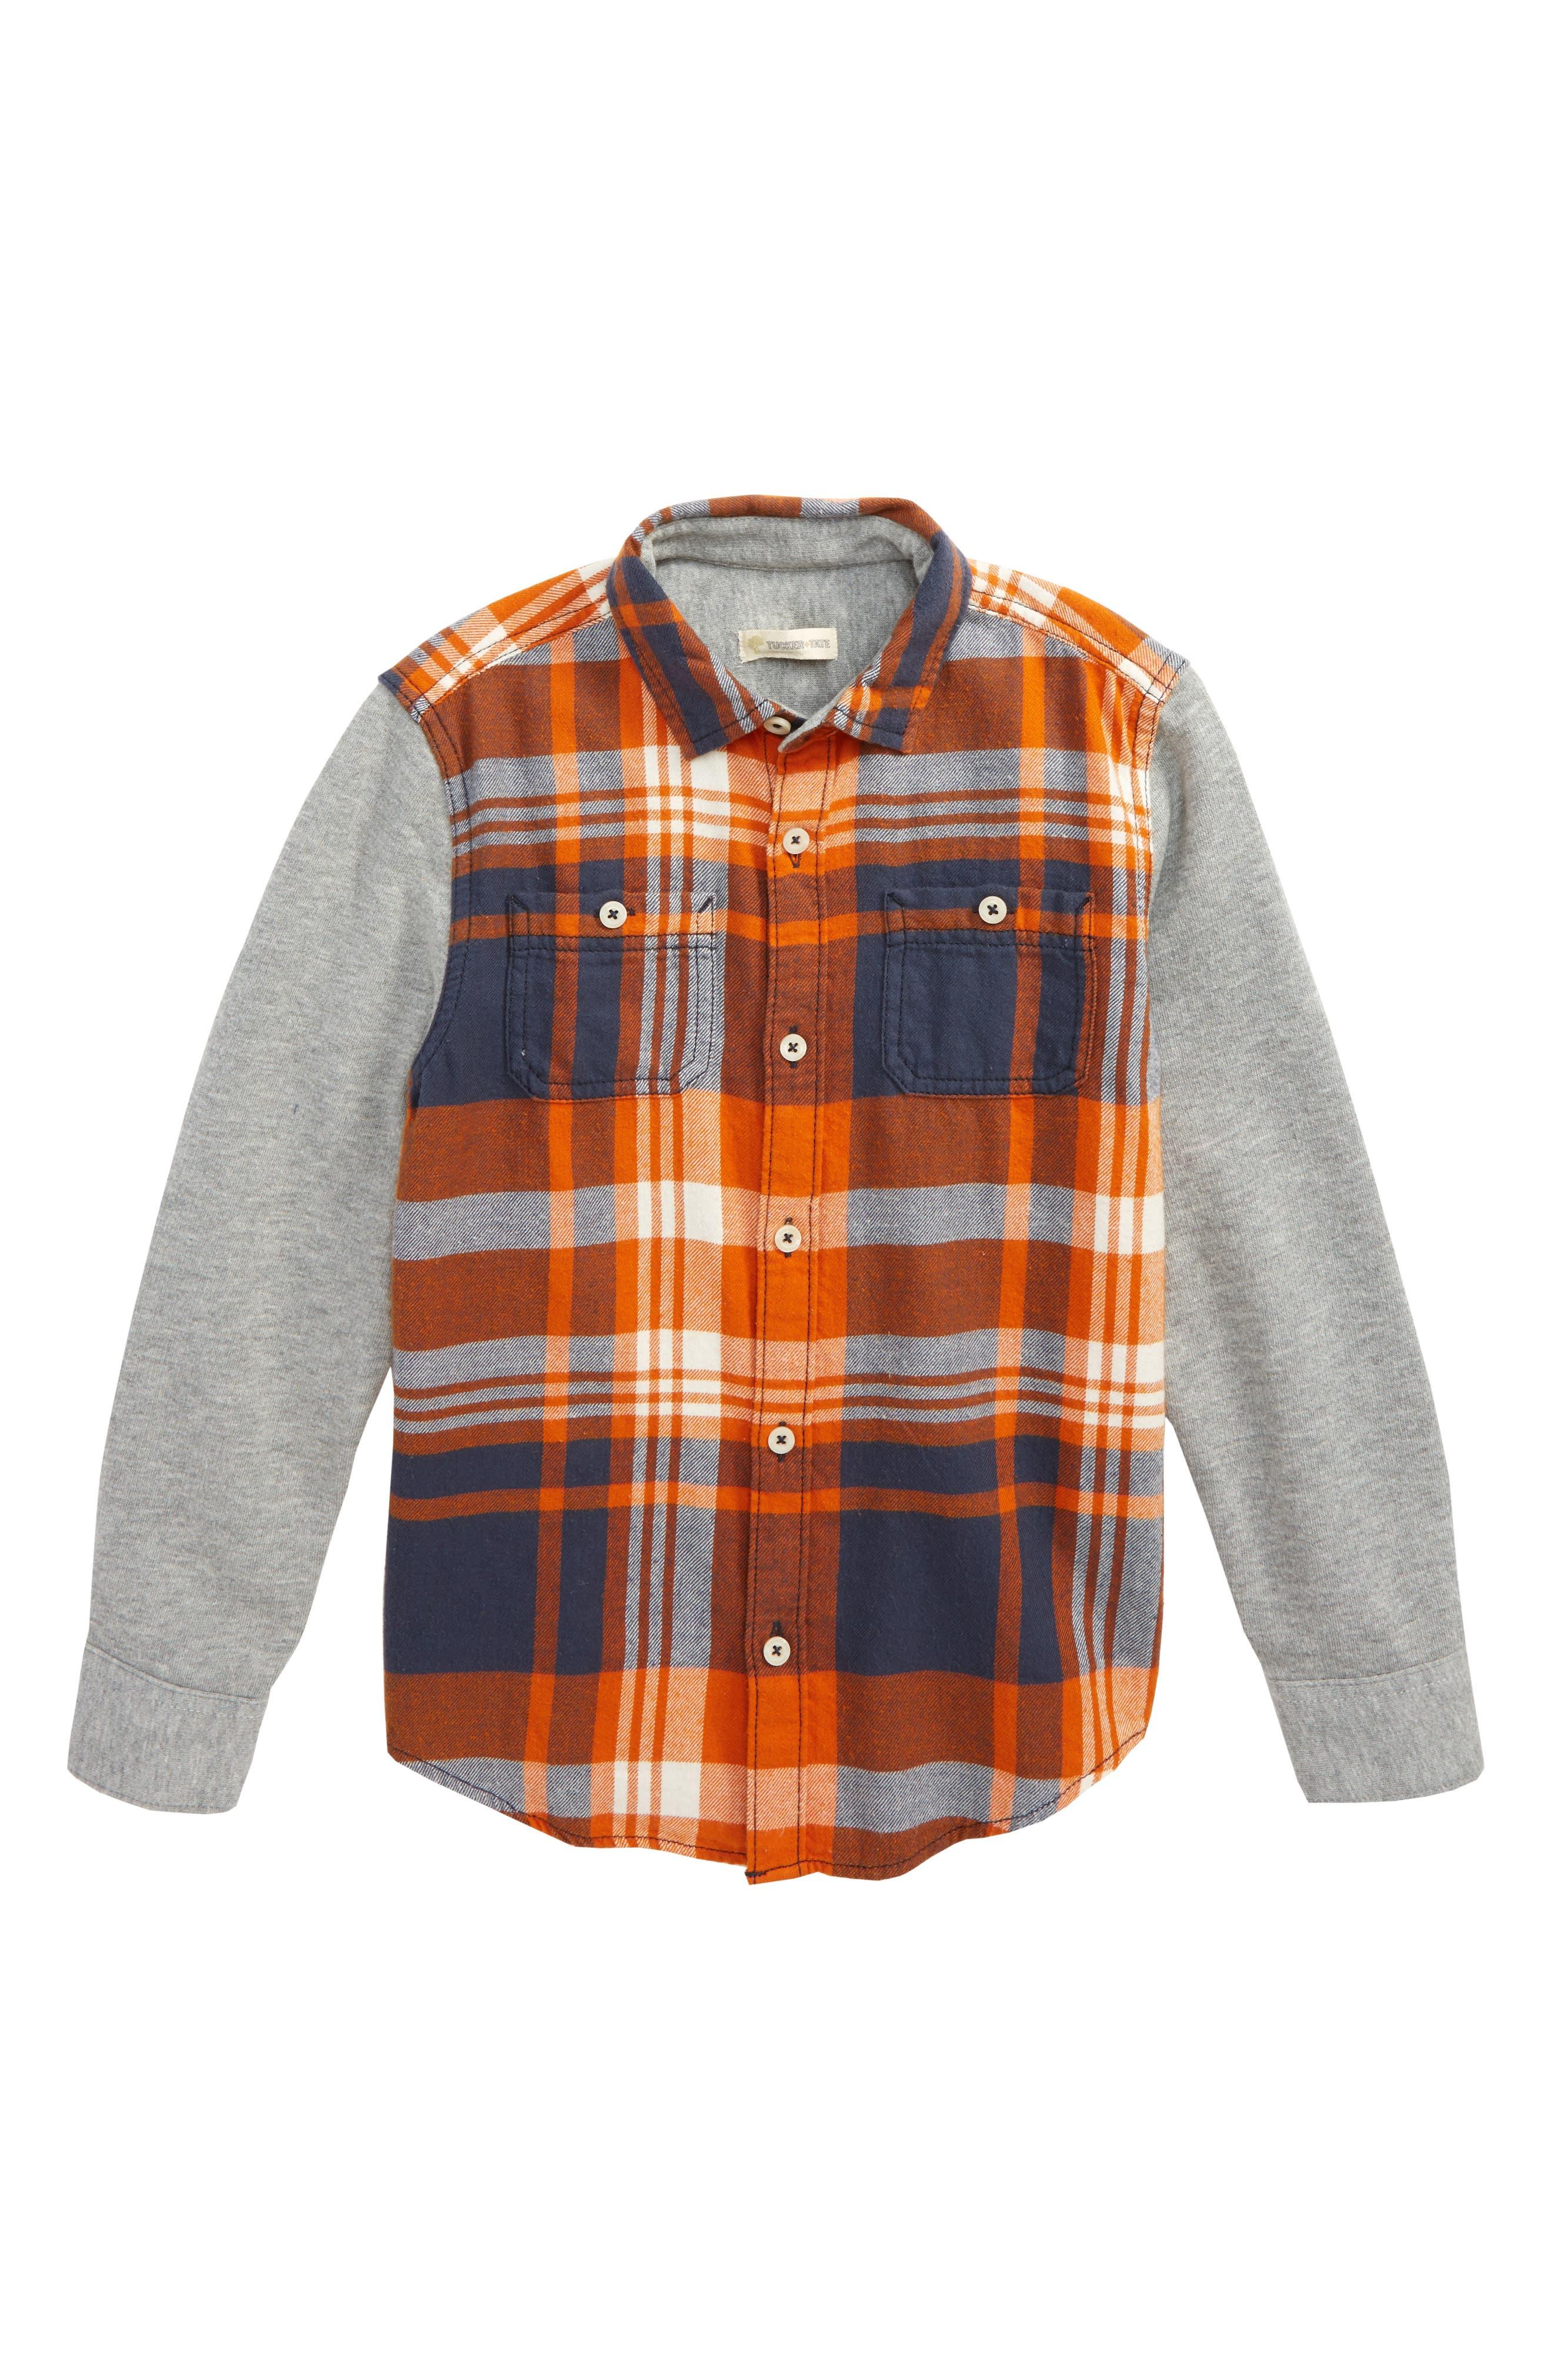 Alternate Image 1 Selected - Tucker + Tate Woven Plaid Shirt (Toddler Boys & Little Boys)